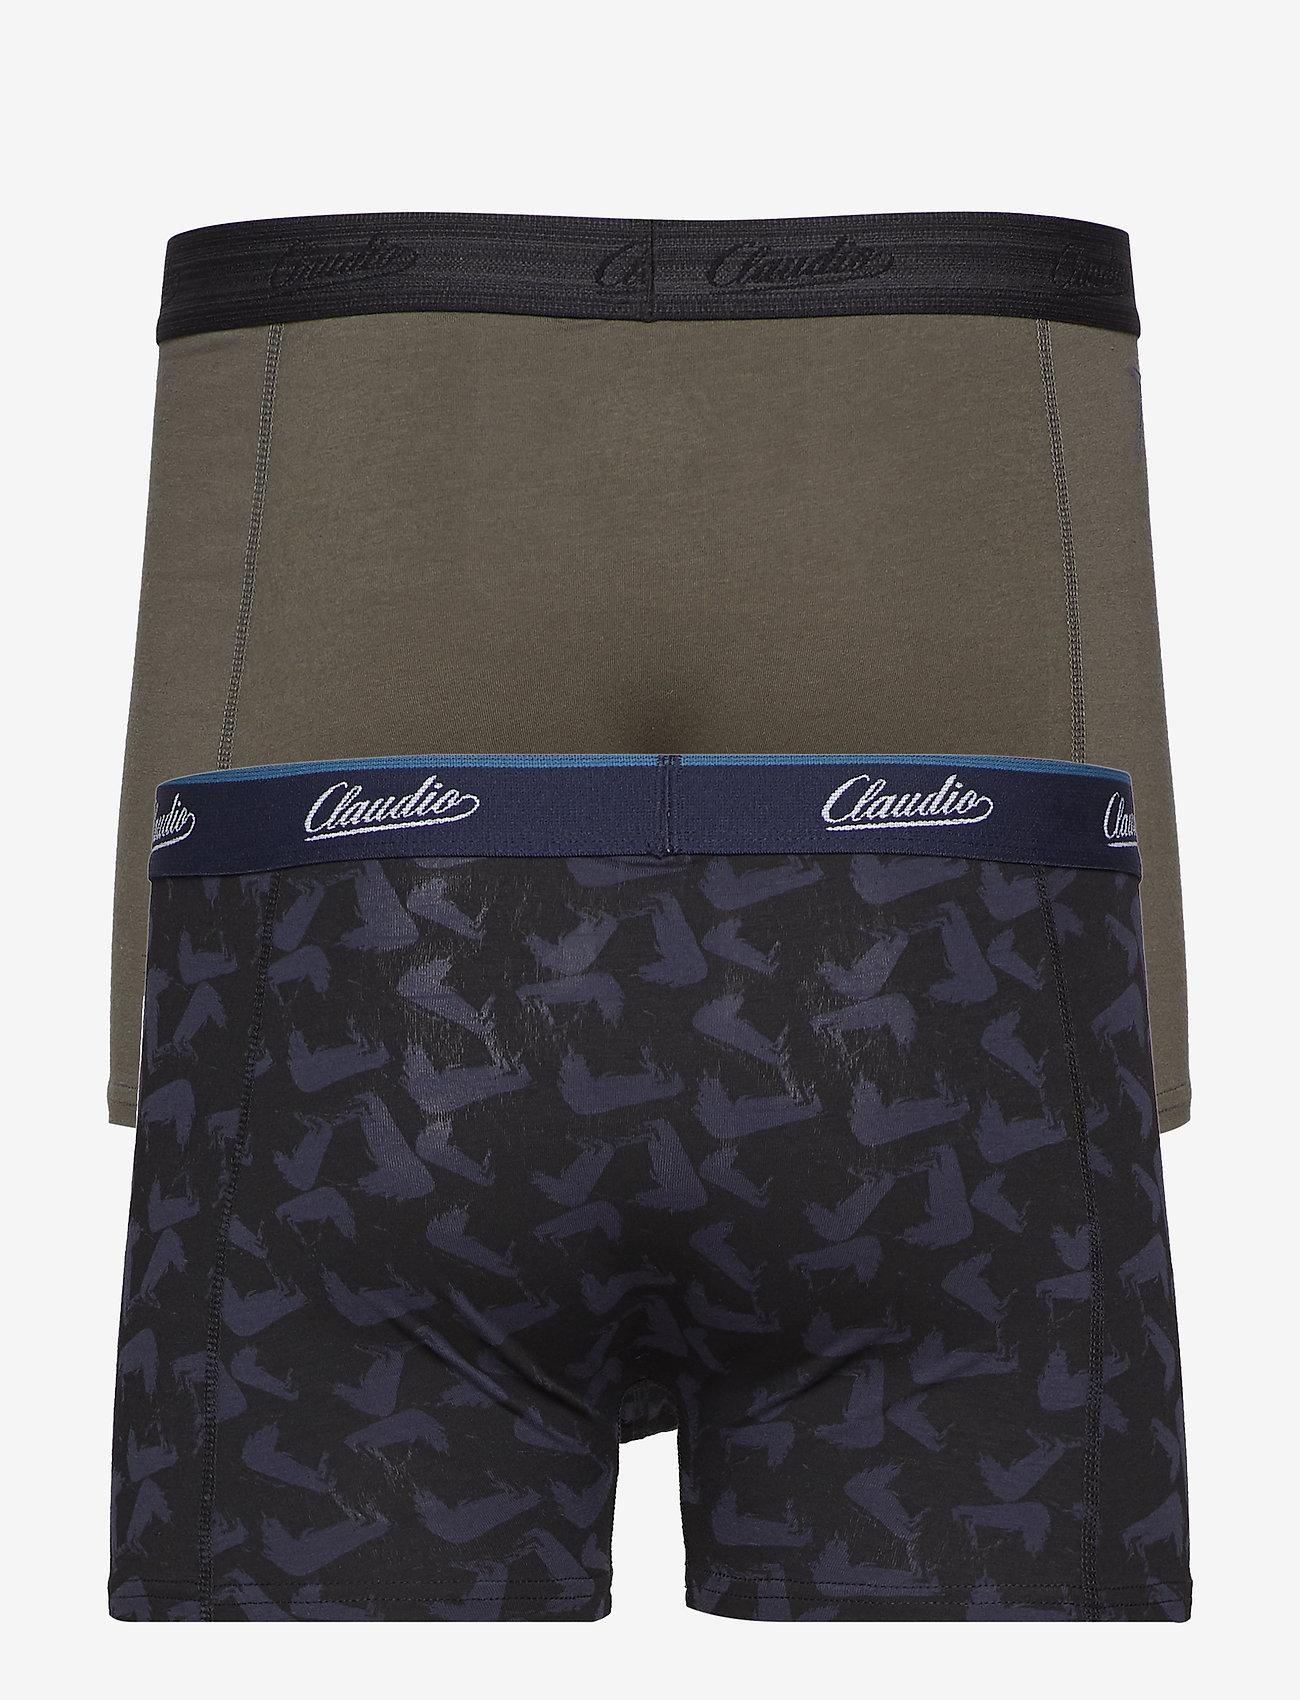 Claudio - Claudio trunk 2-pack - boxershortser - grey+aop - 1